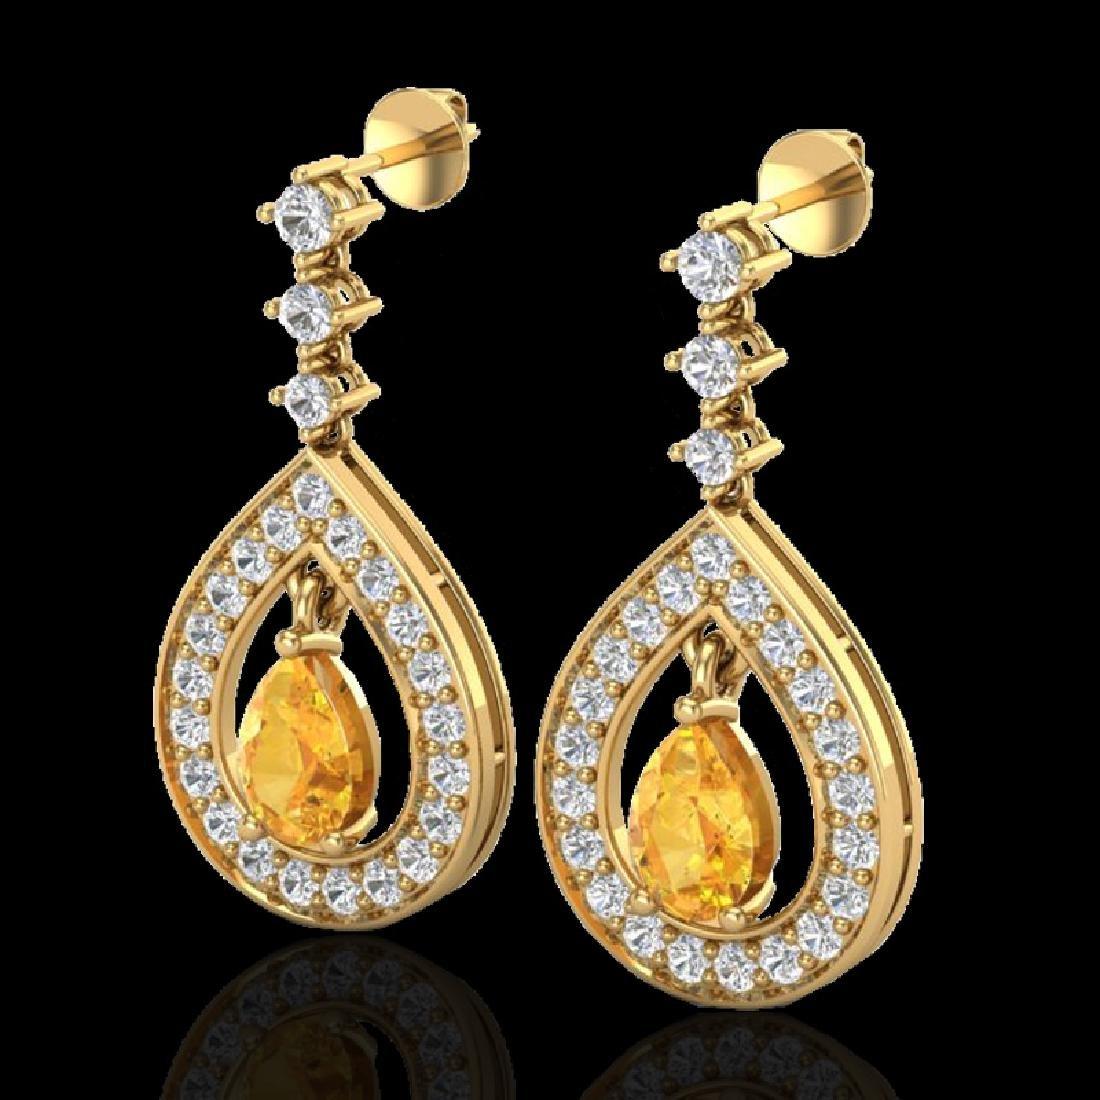 2.25 CTW Citrine & Micro Pave VS/SI Diamond Earrings